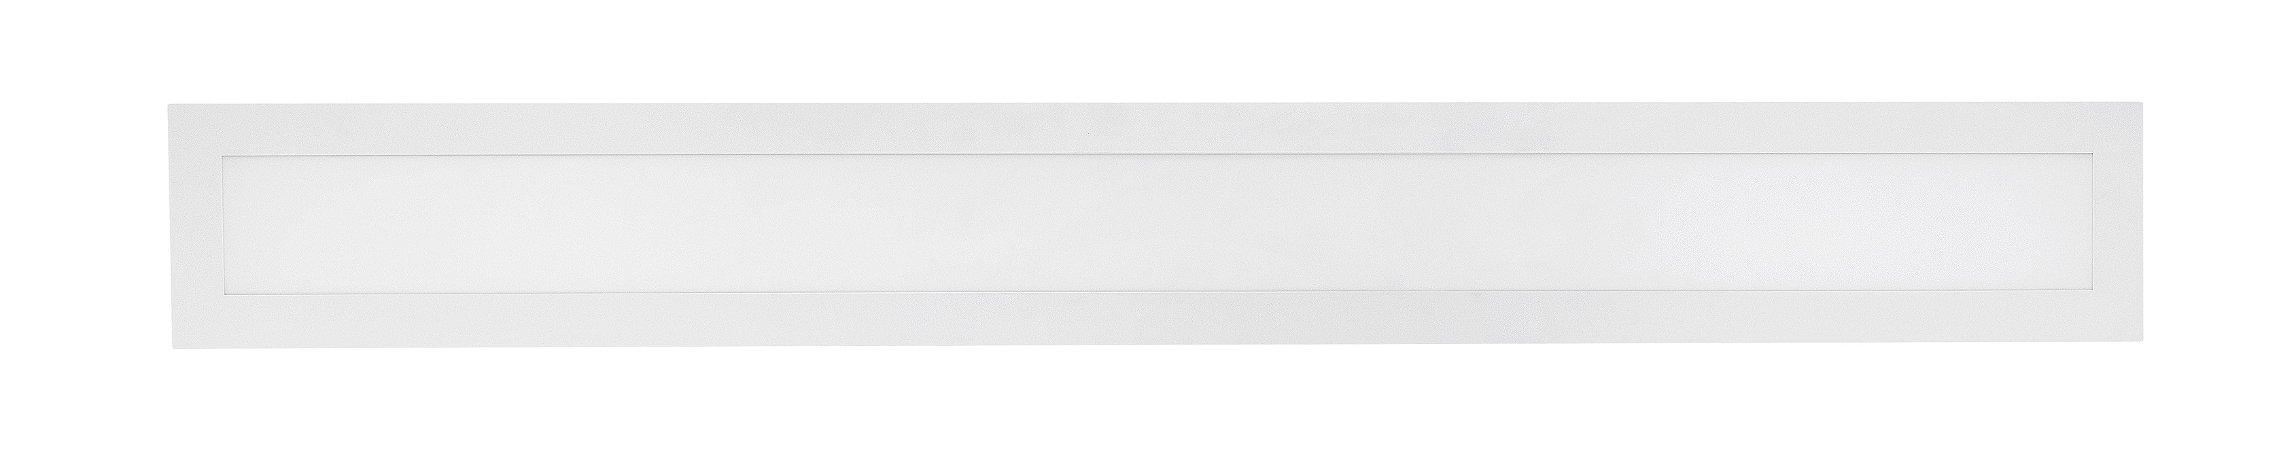 Painel Slim Embutir Retangular 40w 3000k Biv REF: STH9956/30